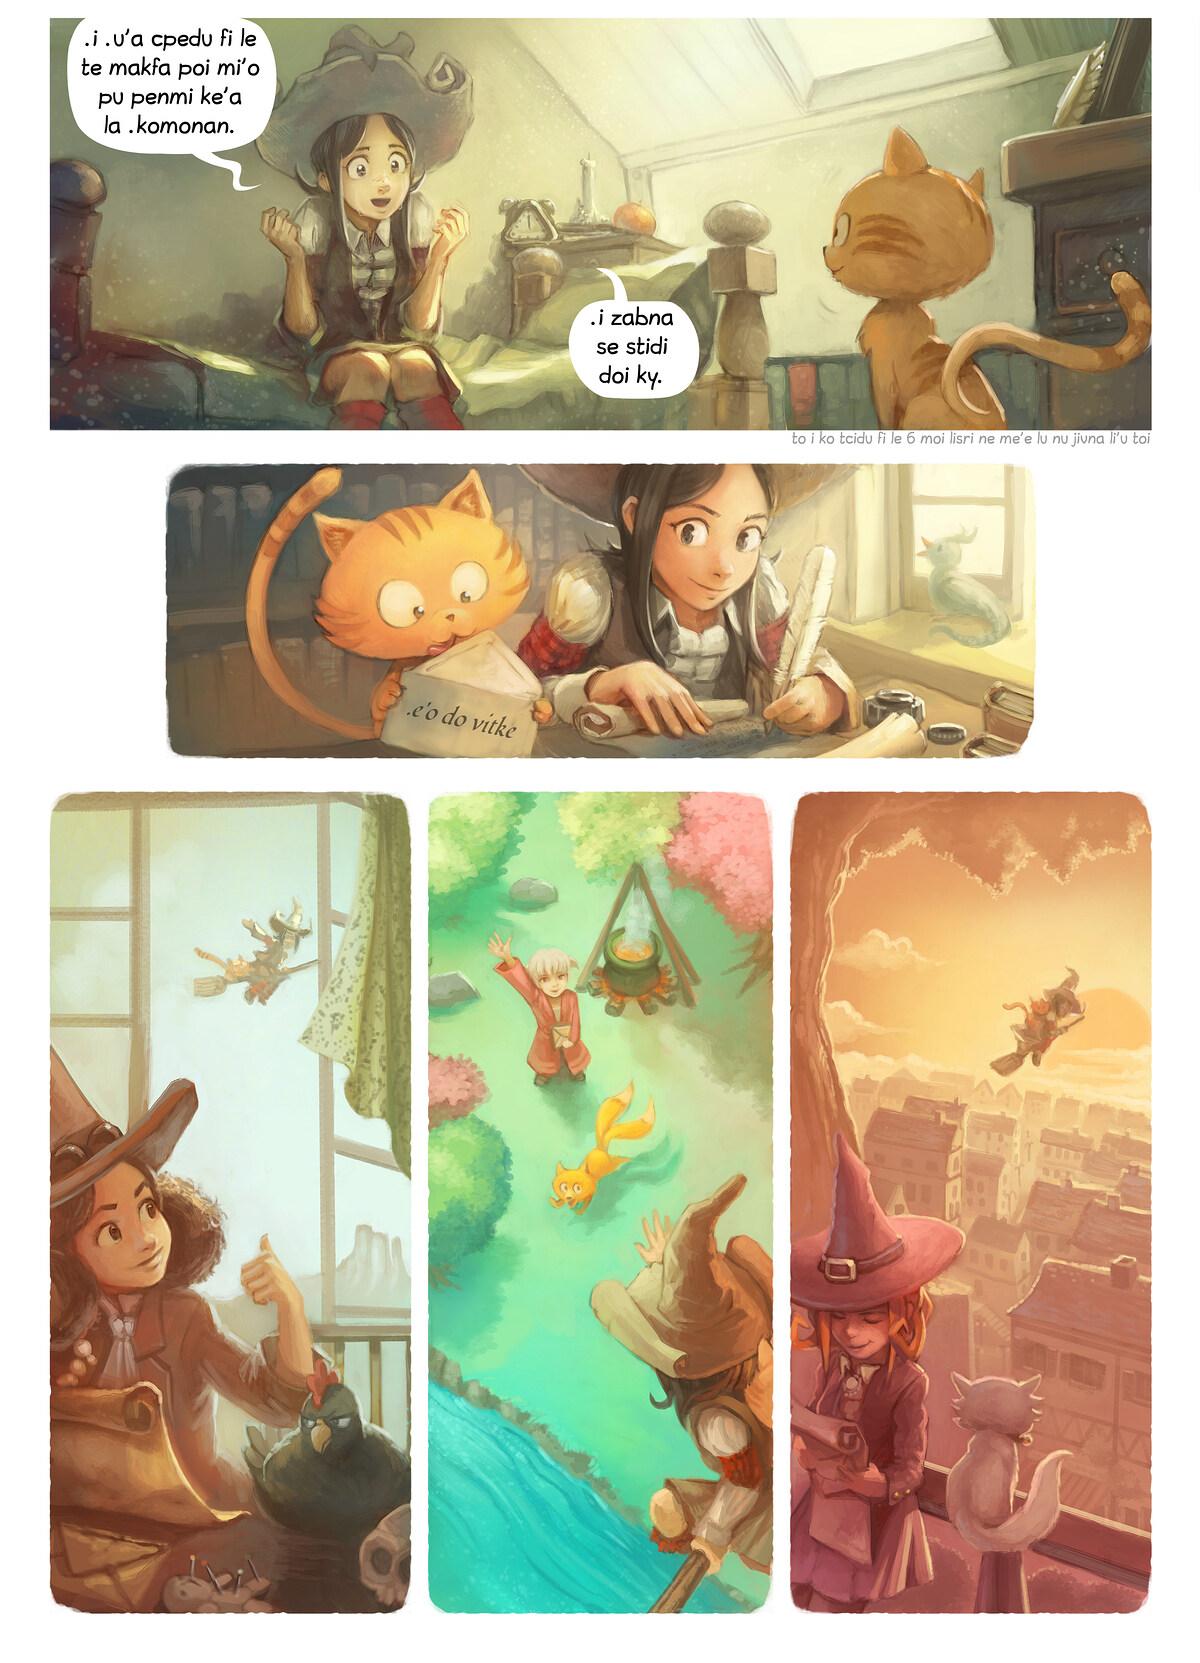 A webcomic page of Pepper&Carrot, pagbu 8 [jb], papri 2